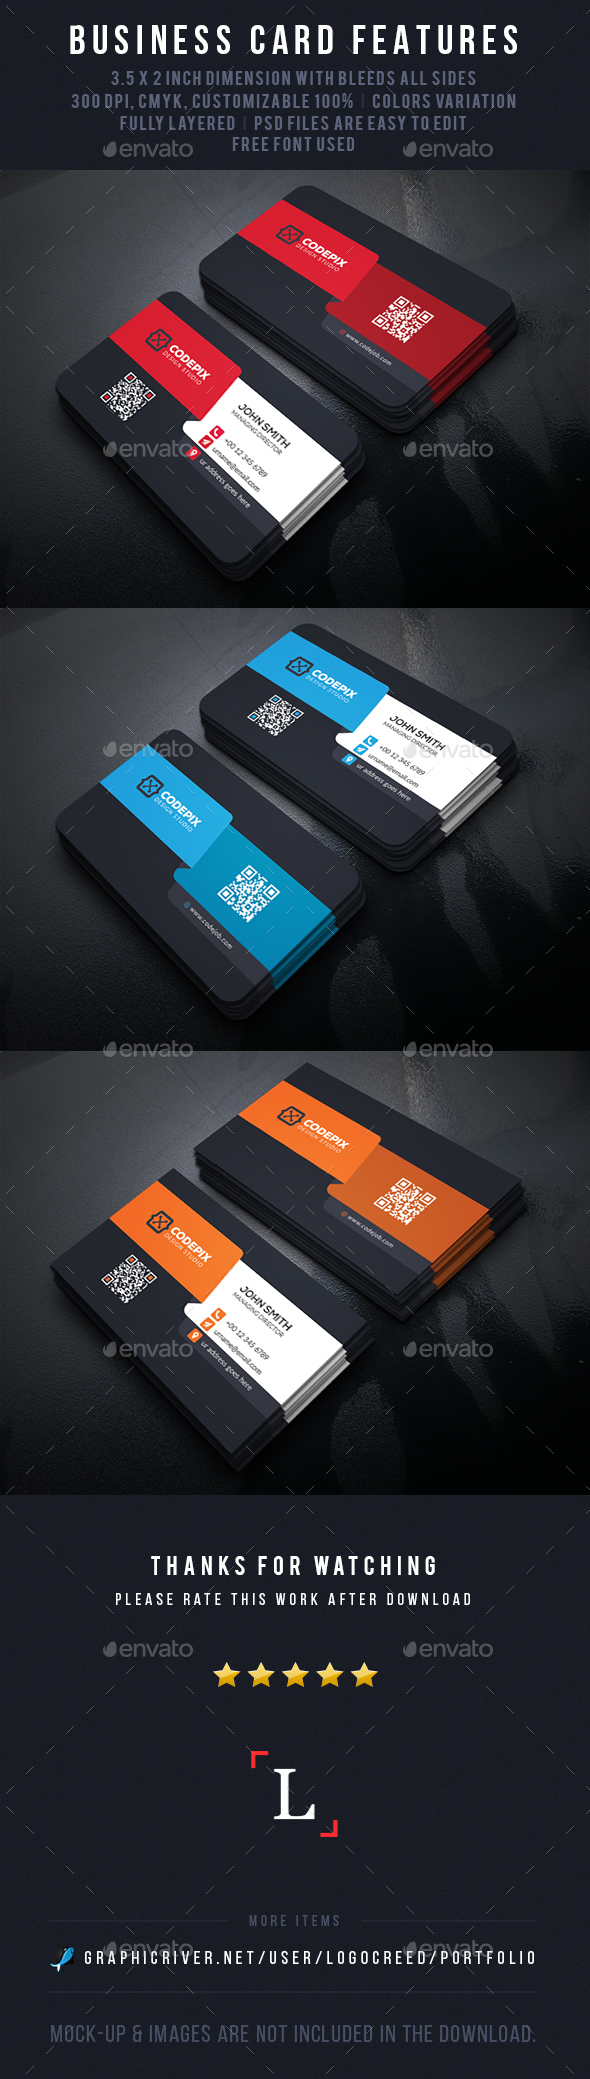 Shape Business Card - Business Cards Print Templates